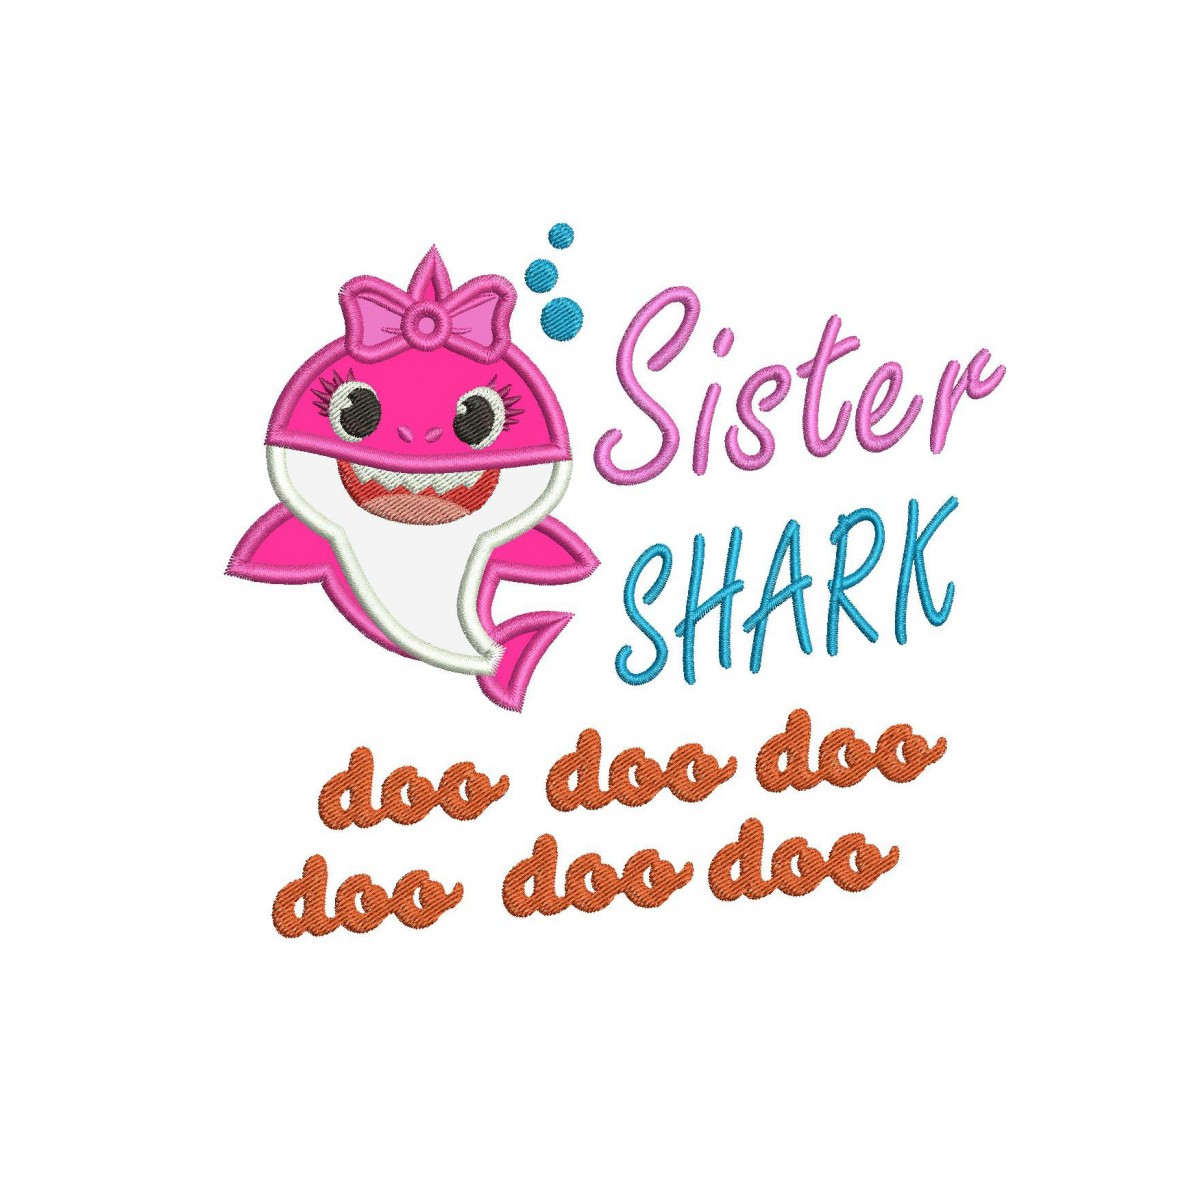 Sister Shark Applique Shark Family Doo Doo Applique Design